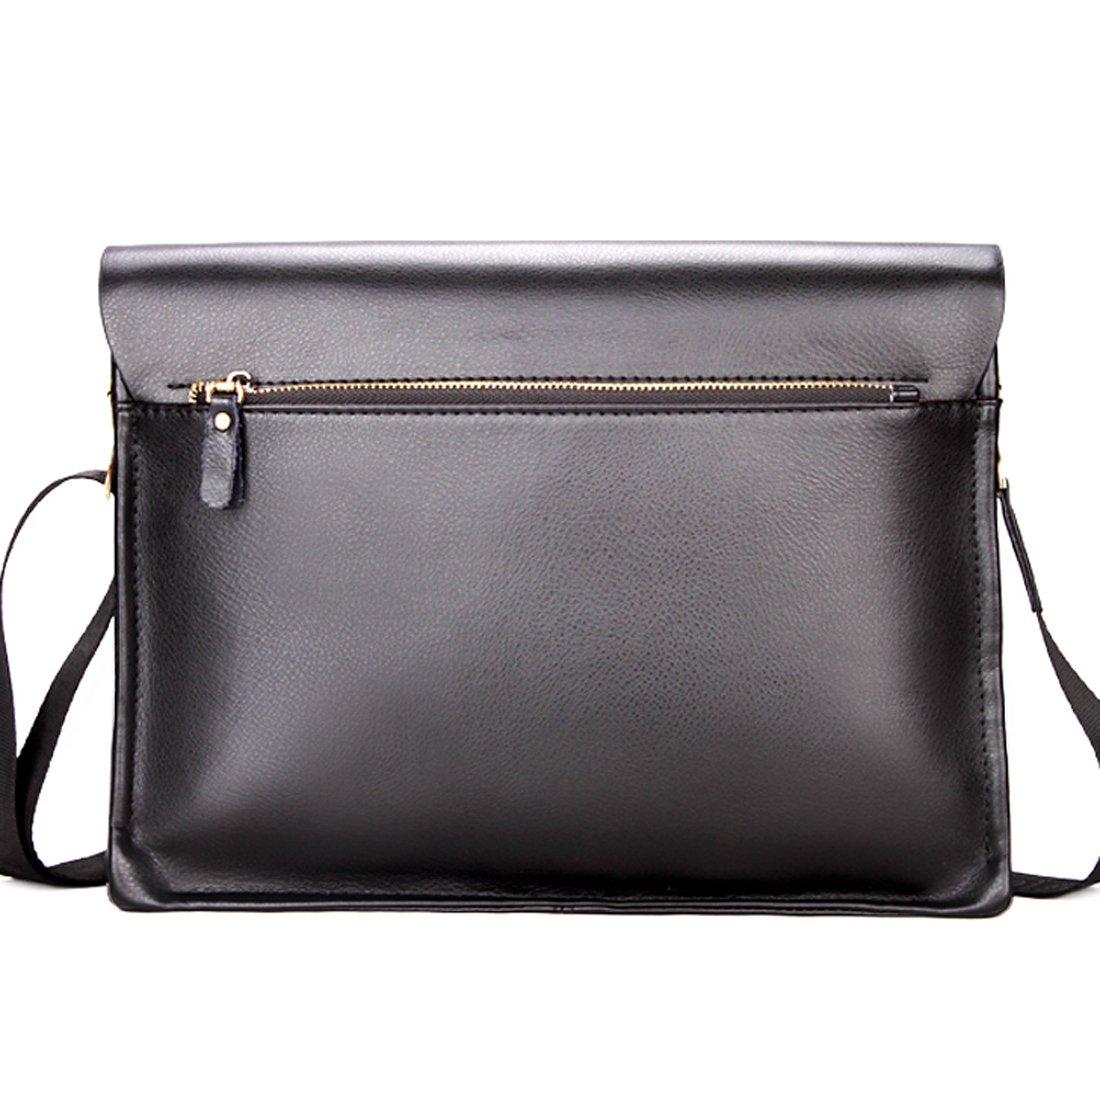 VICUNA POLO Men Messenger Bags Business Bag for Men Leather Shoulder Bag  (Horizontal c20f353b1752a